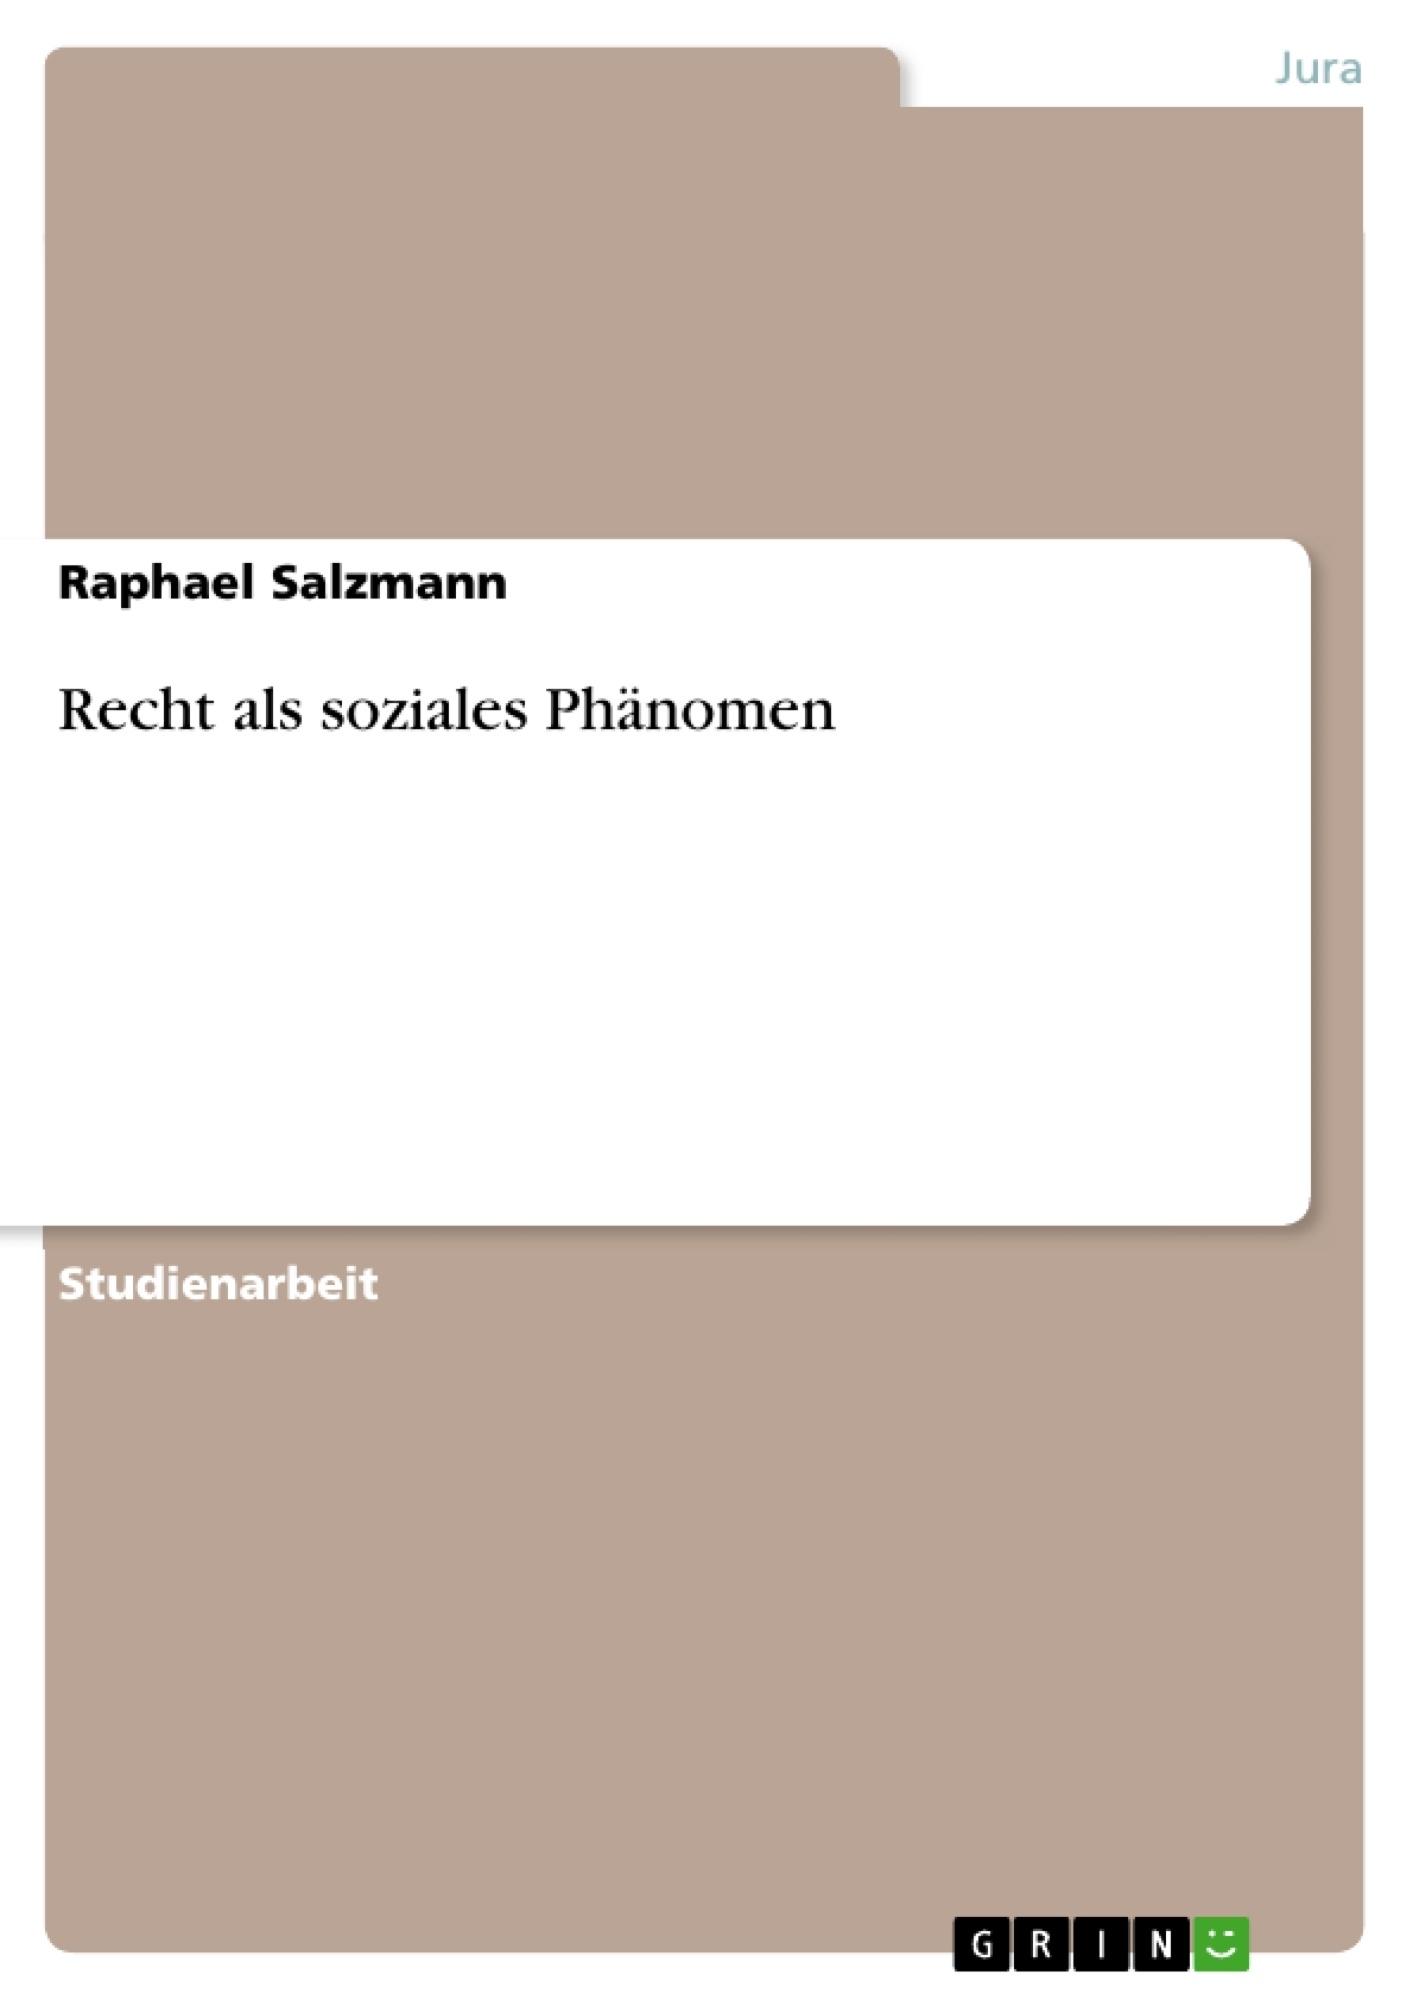 Titel: Recht als soziales Phänomen